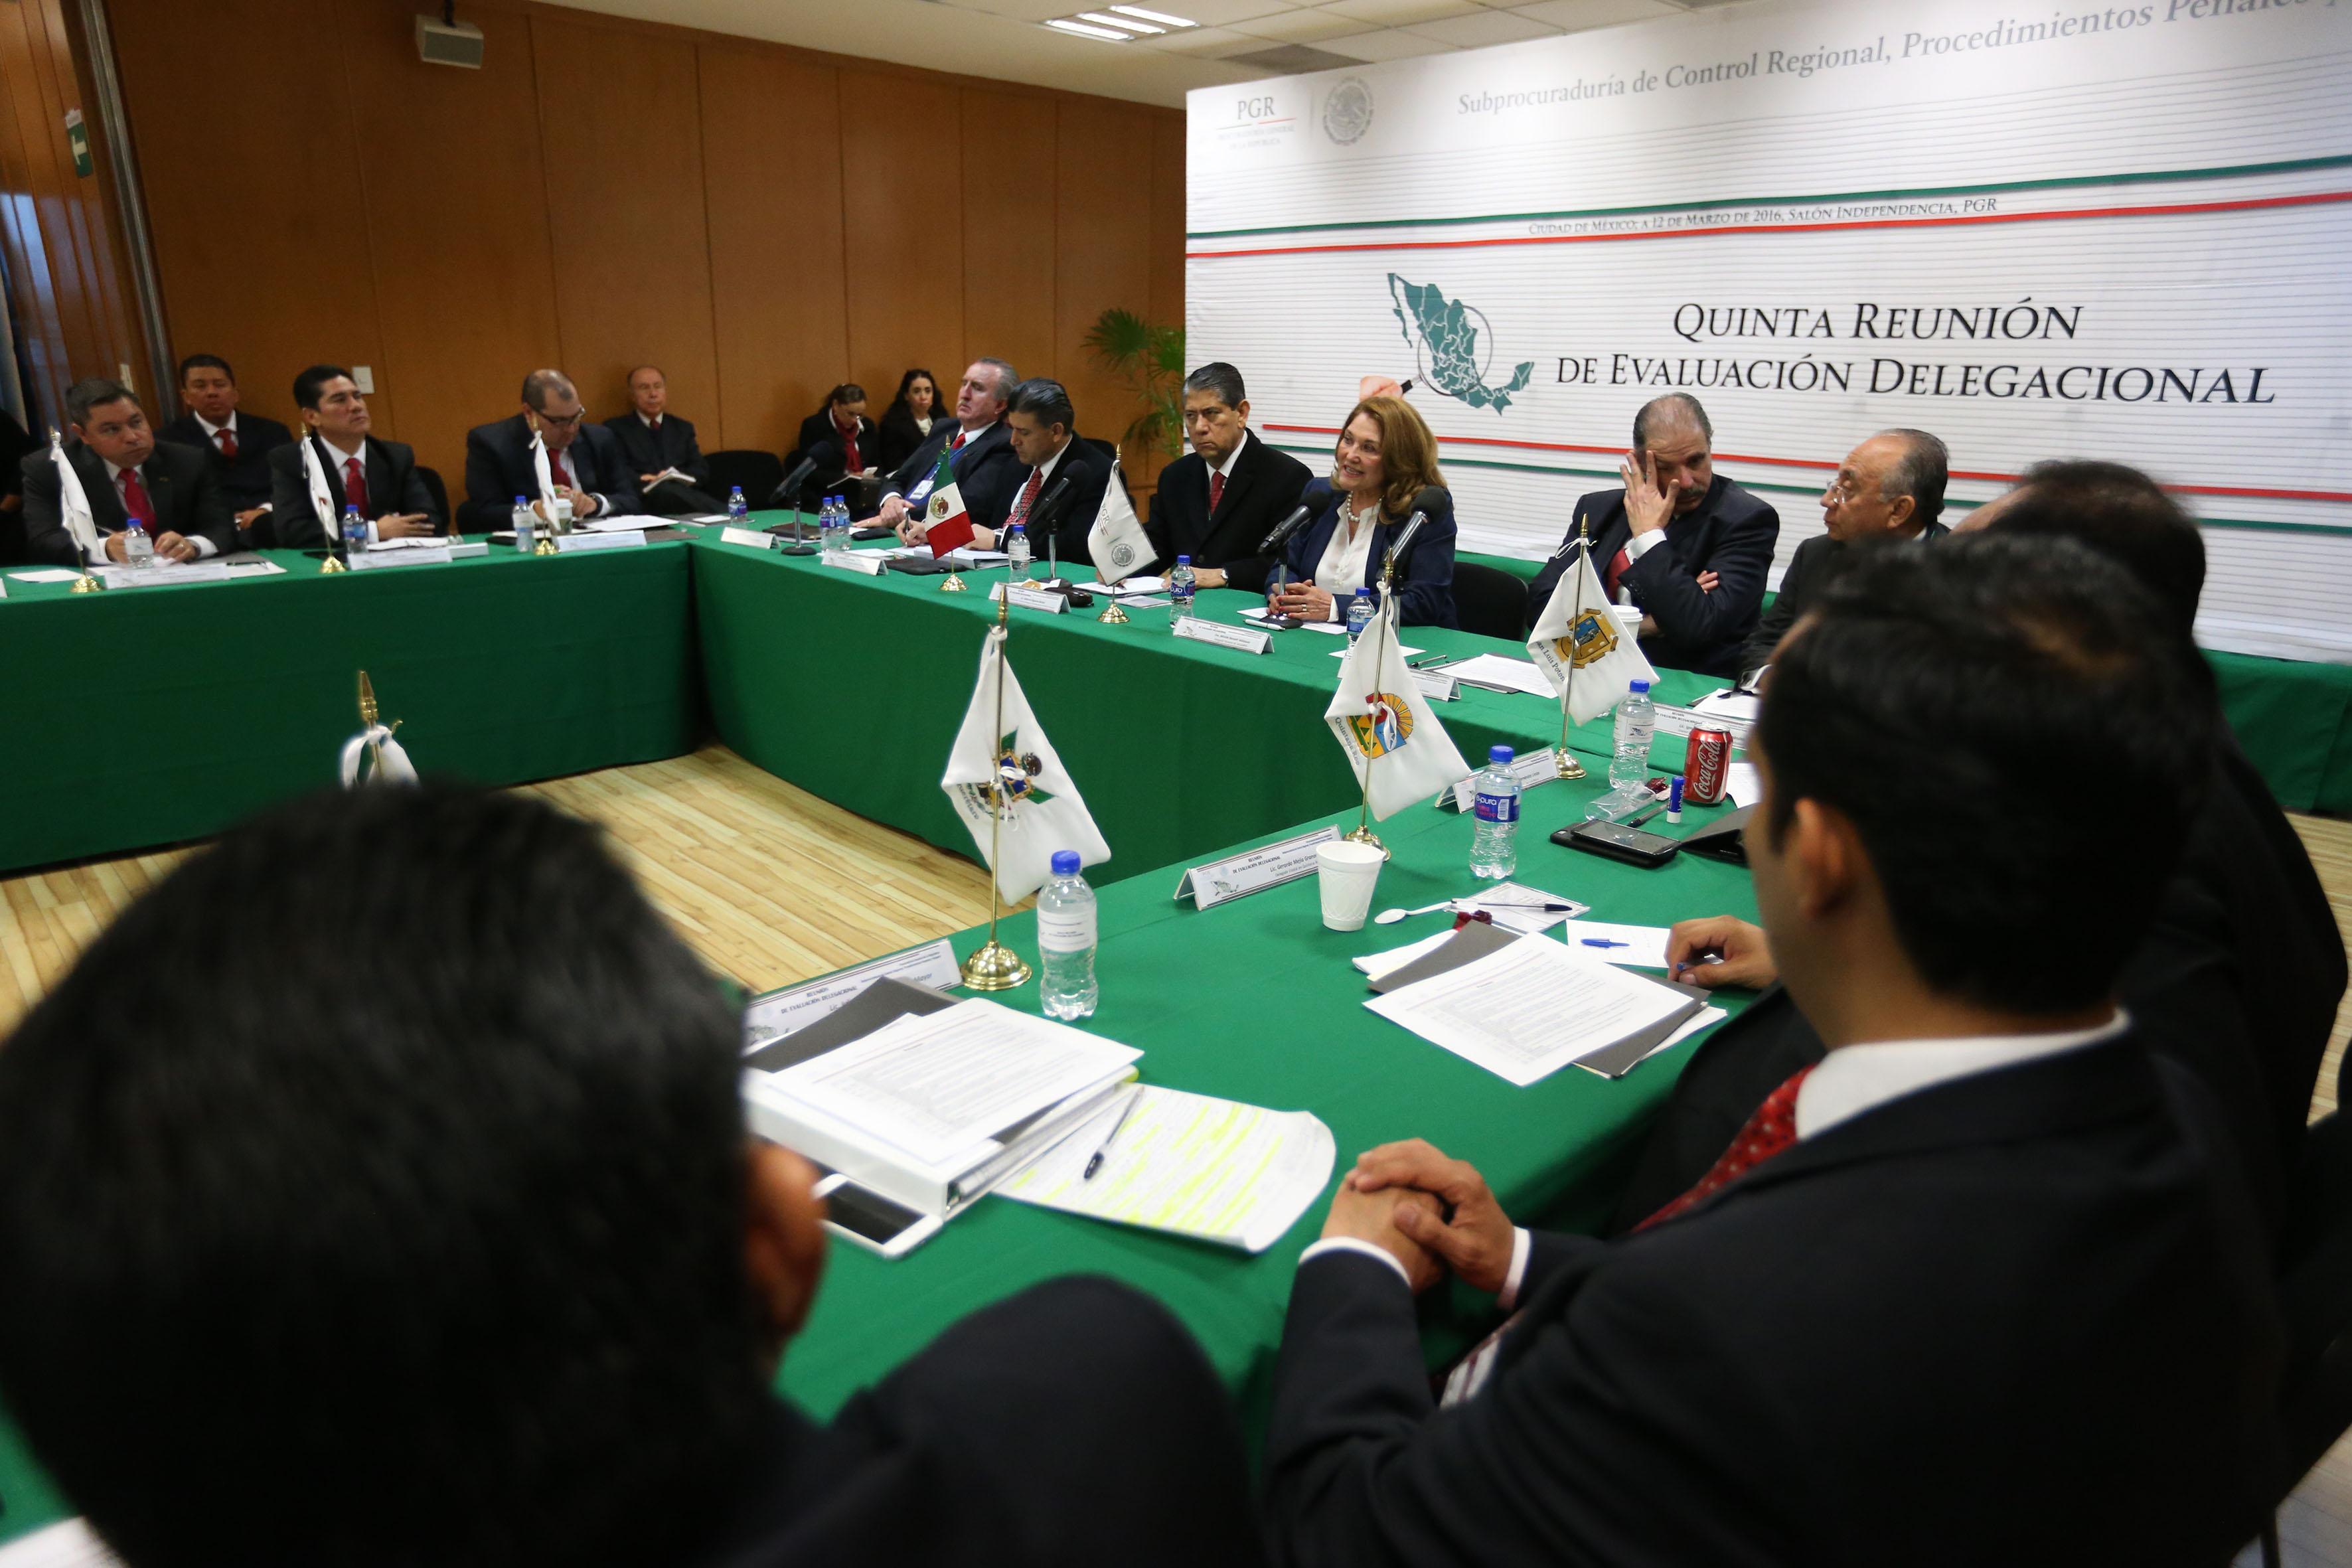 12 03 16 5a Reunio n delegacional PGR10.jpg